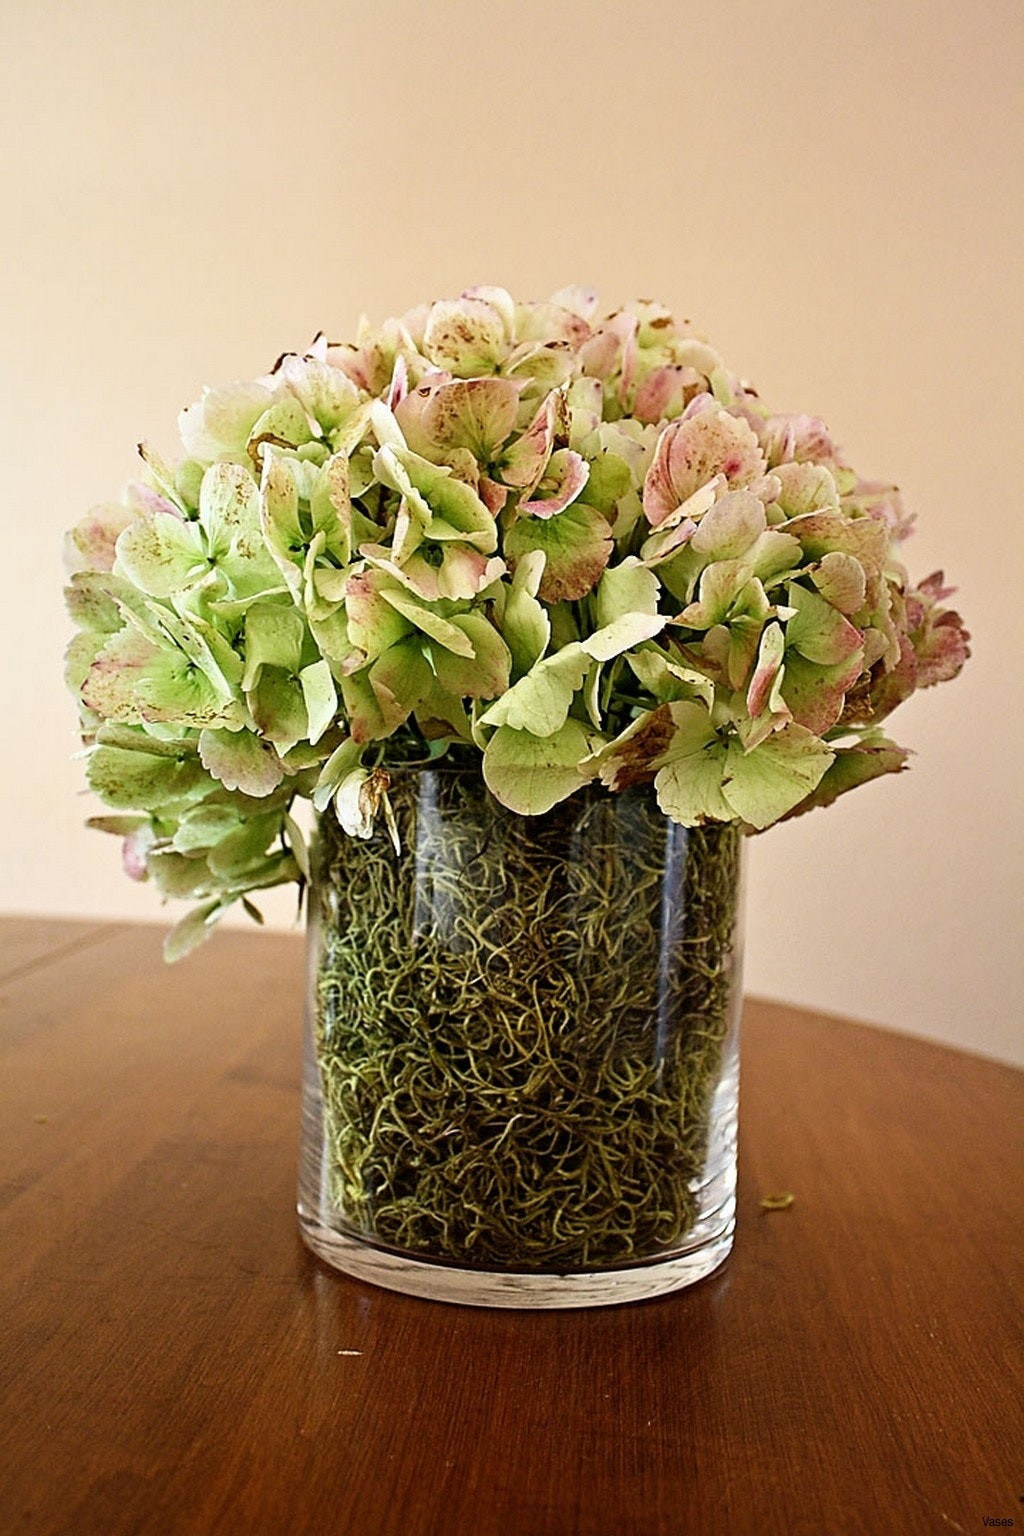 green vase filler of sophisticated features flower picture natural pets nature wallpaper for ideas for flower vase fillers with natural green flowerh vases floweri 0d